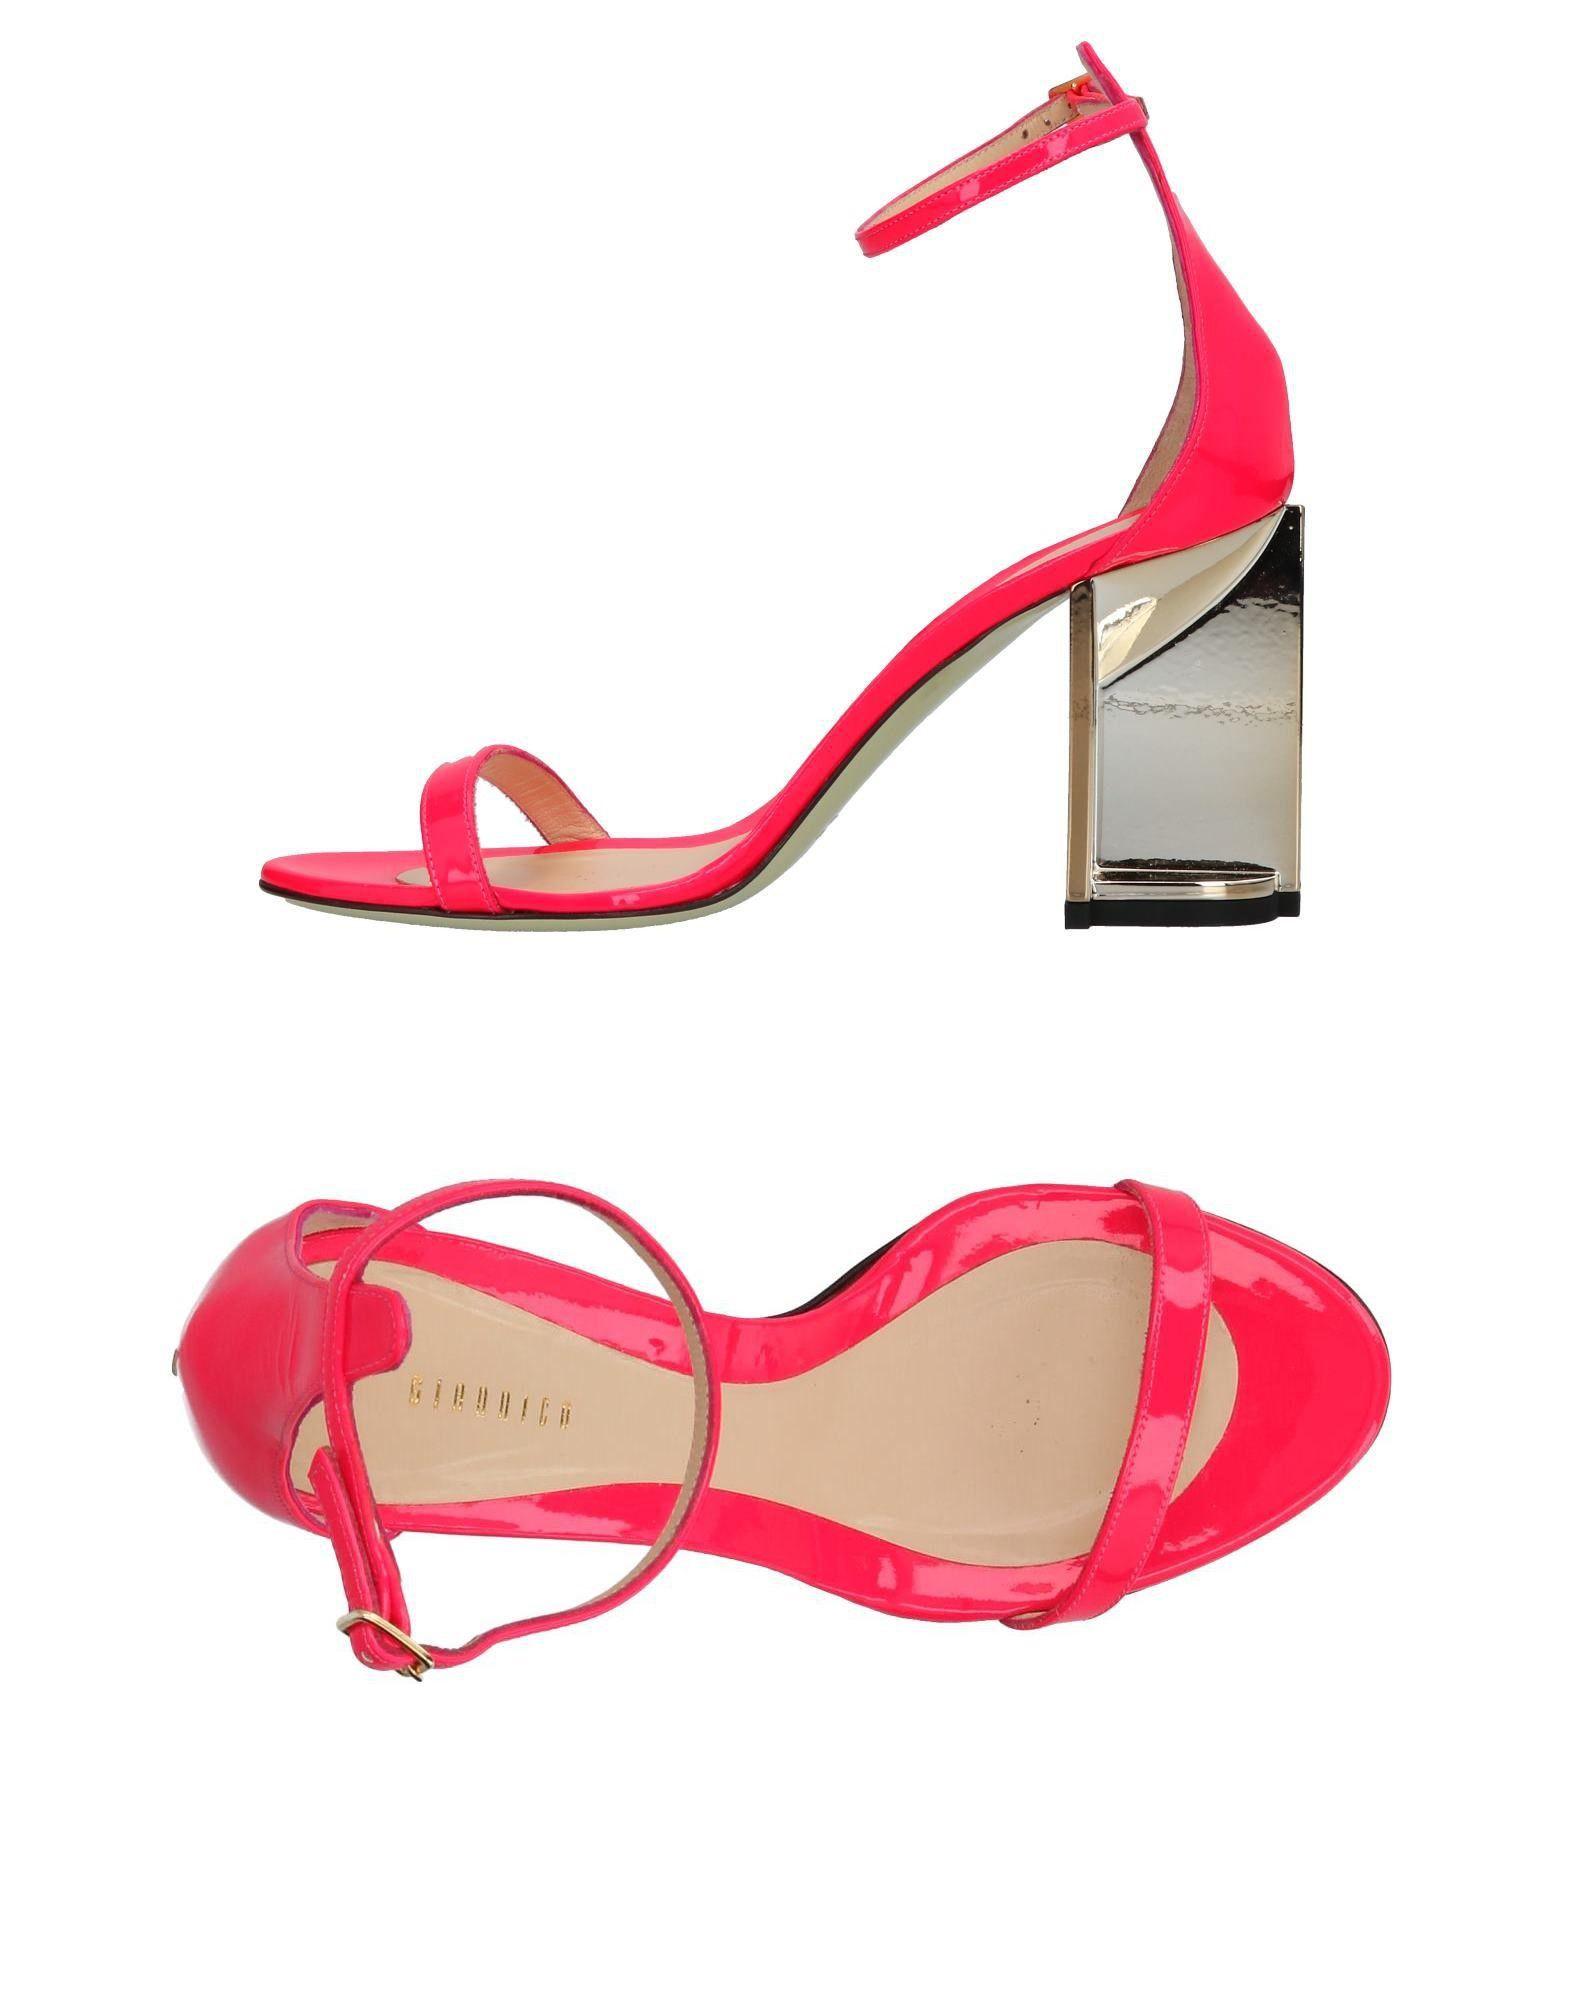 GIANNICO Damen Sandale Farbe Fuchsia Größe 7 - broschei